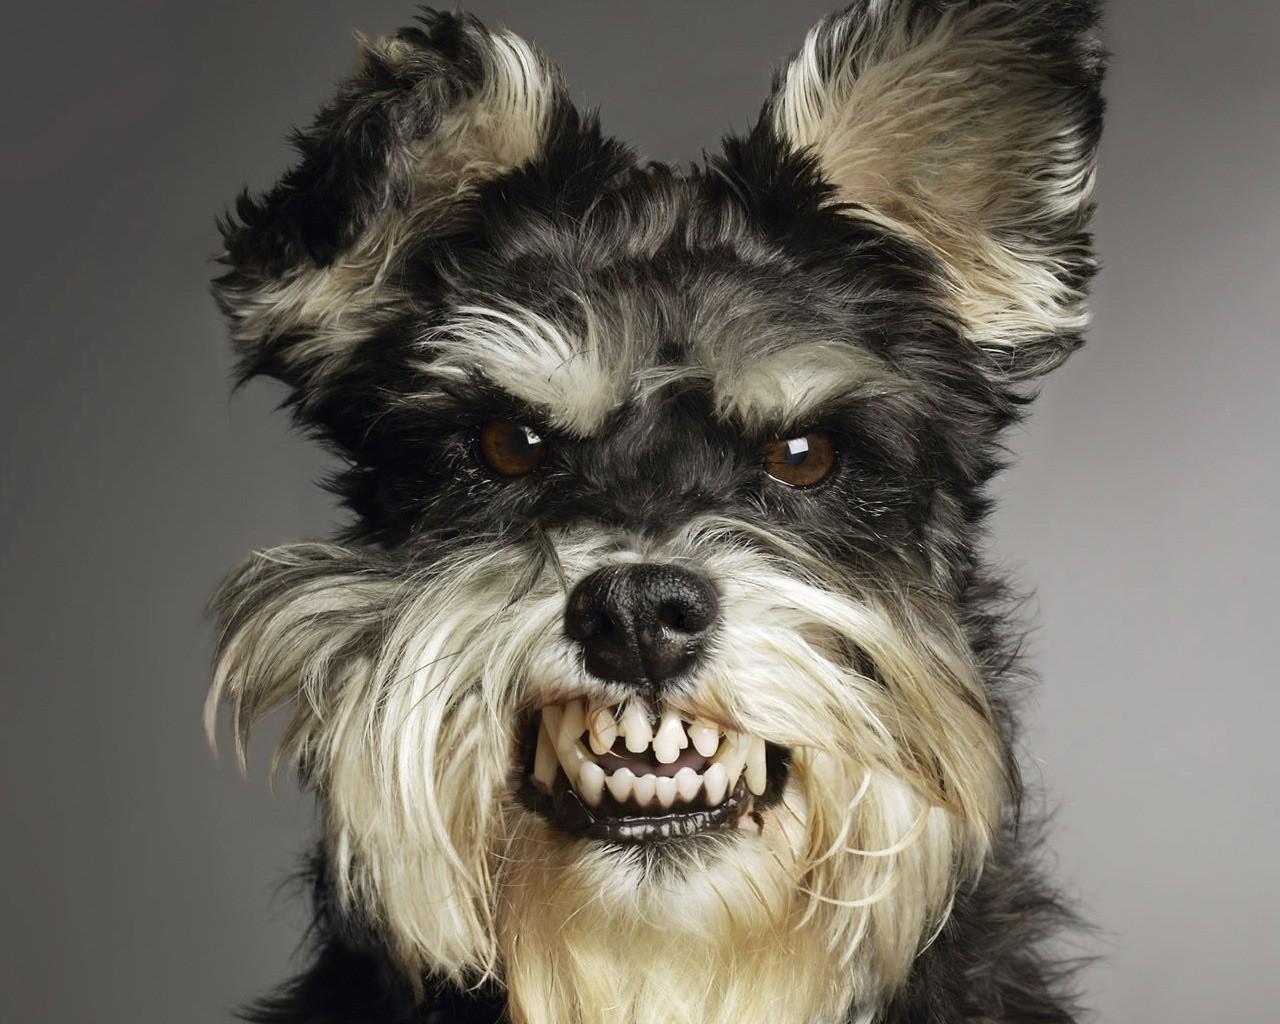 http://2.bp.blogspot.com/-pT3A5jwjLGo/UFpDfC_S-YI/AAAAAAAAGN4/tbBxubJRIxc/s1600/Free-High-Quality-Wallpaper-Of-Most-Dangerous-And-Ugly-Dog.jpg